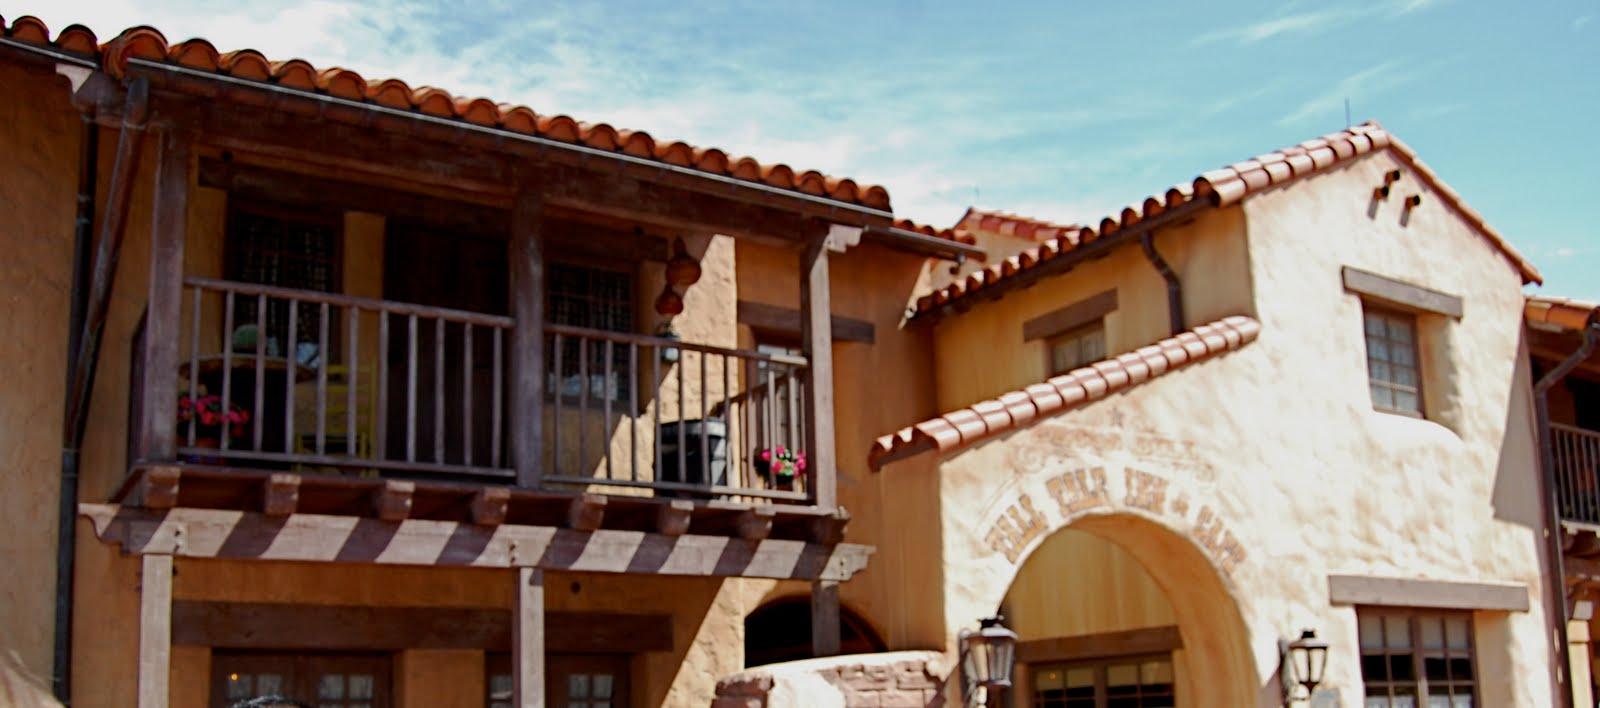 Free home plans mexican hacienda floor plans for Hacienda design homes